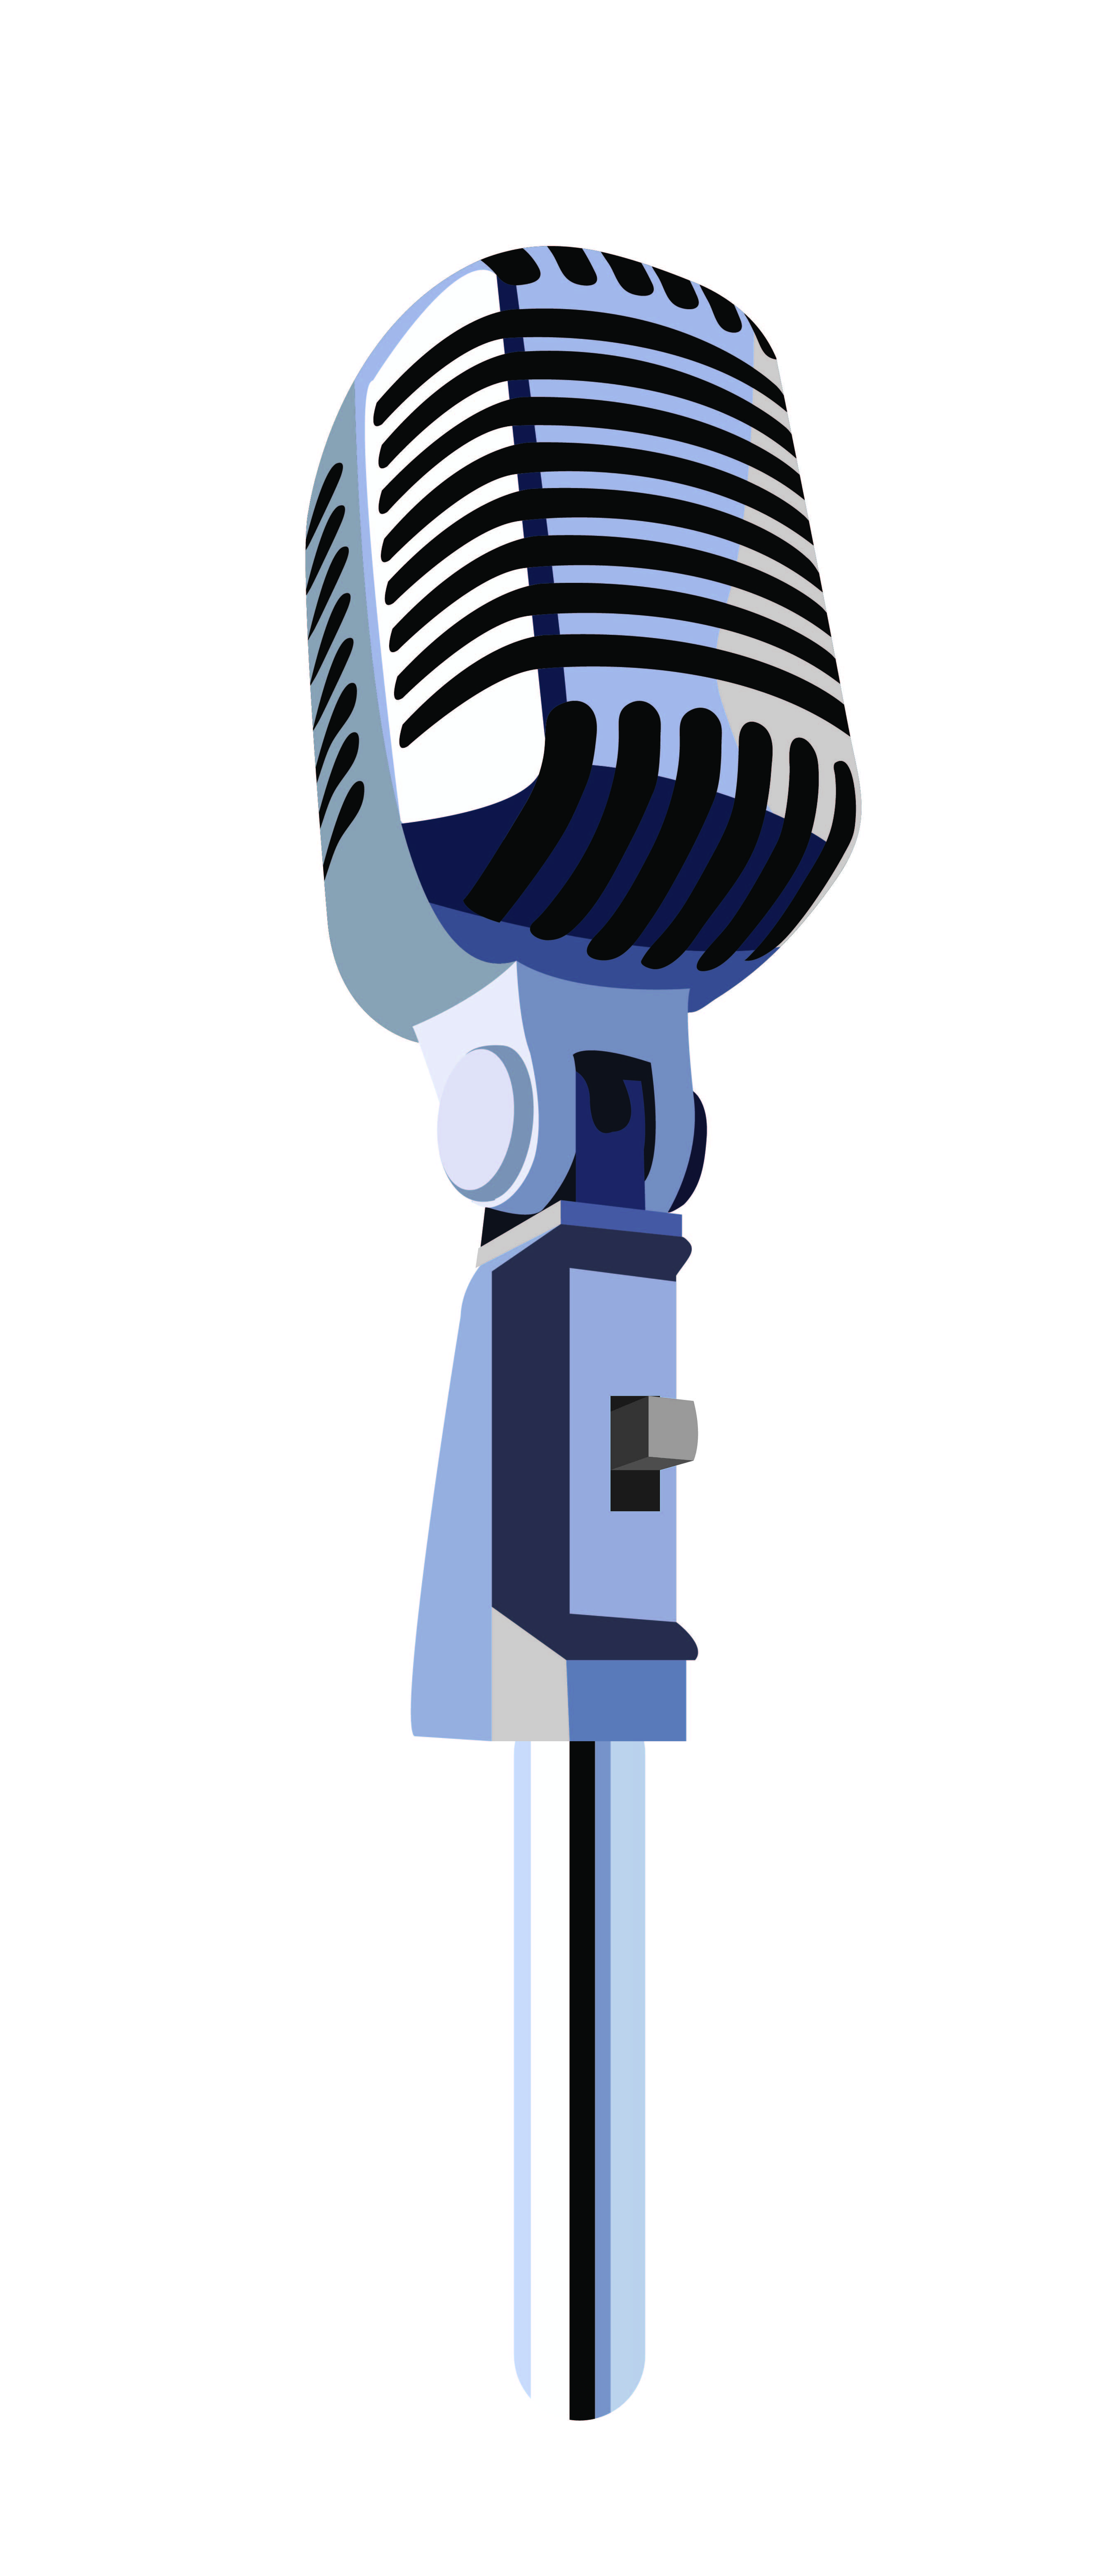 2683x6249 Microphone